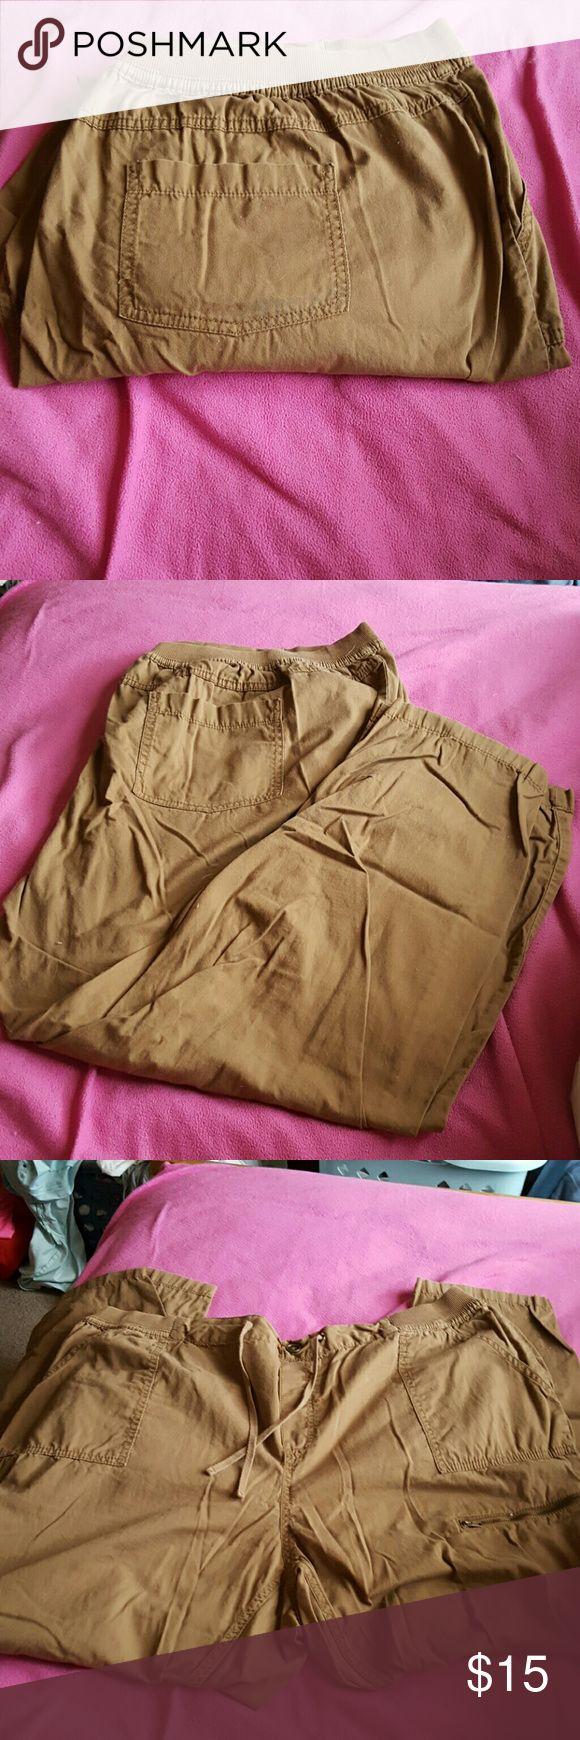 Like new plus size 26w khaki pants. Faded glory Like new plus size 26w khaki pants. Faded glory Faded Glory Pants Boot Cut & Flare